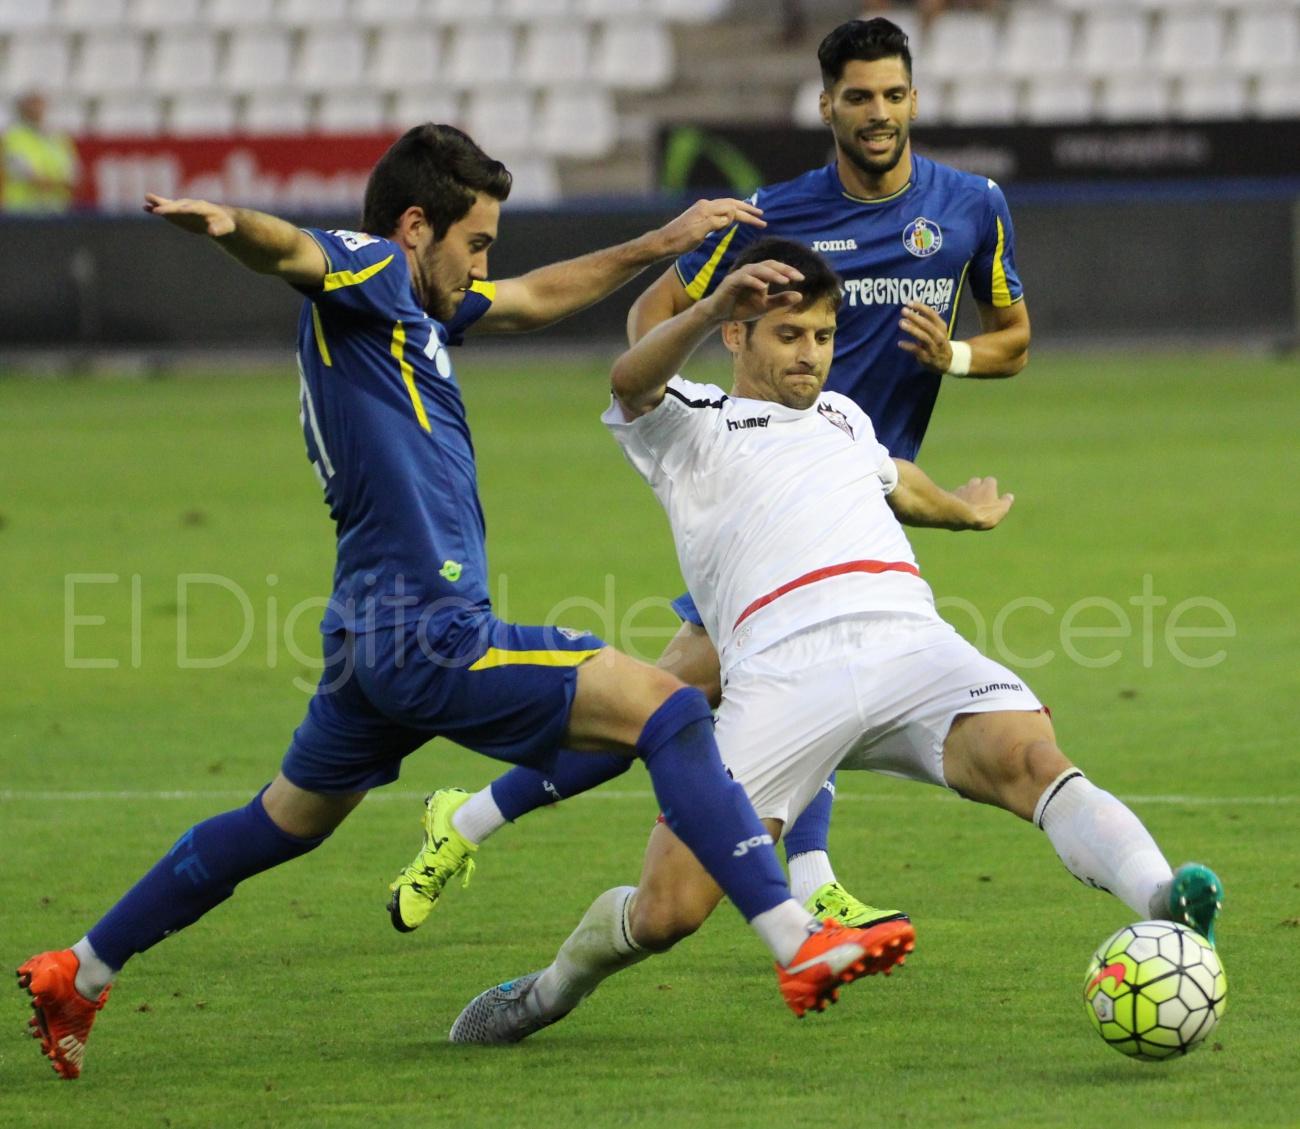 Albacete Balompié Getafe Pretemporada Javi Romero  19